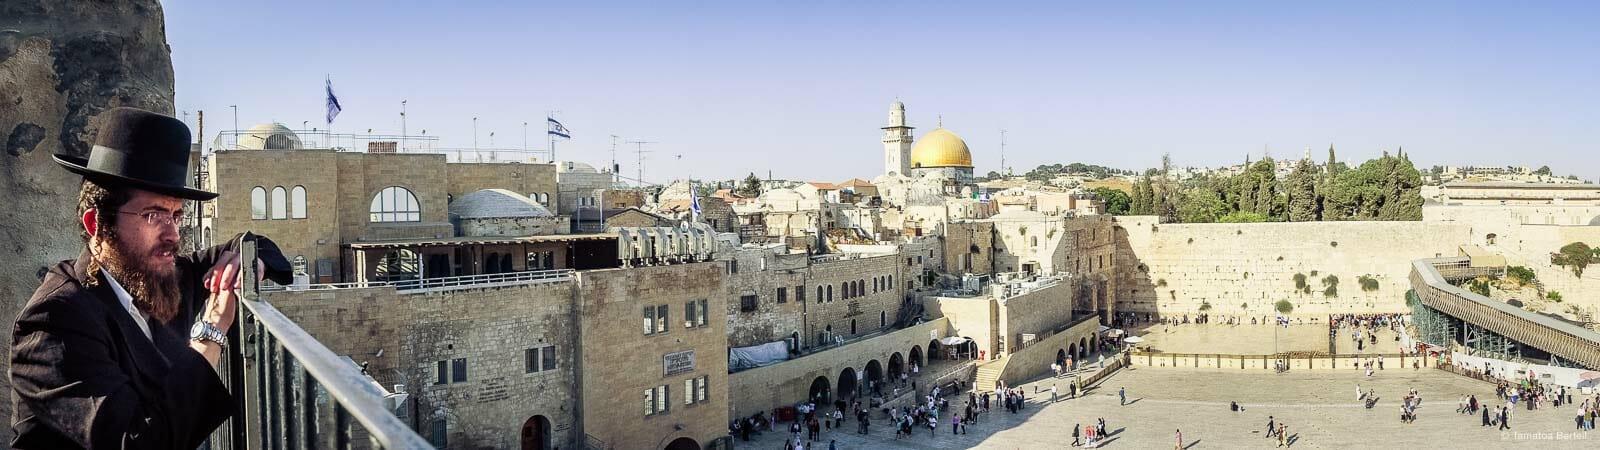 Israel-089